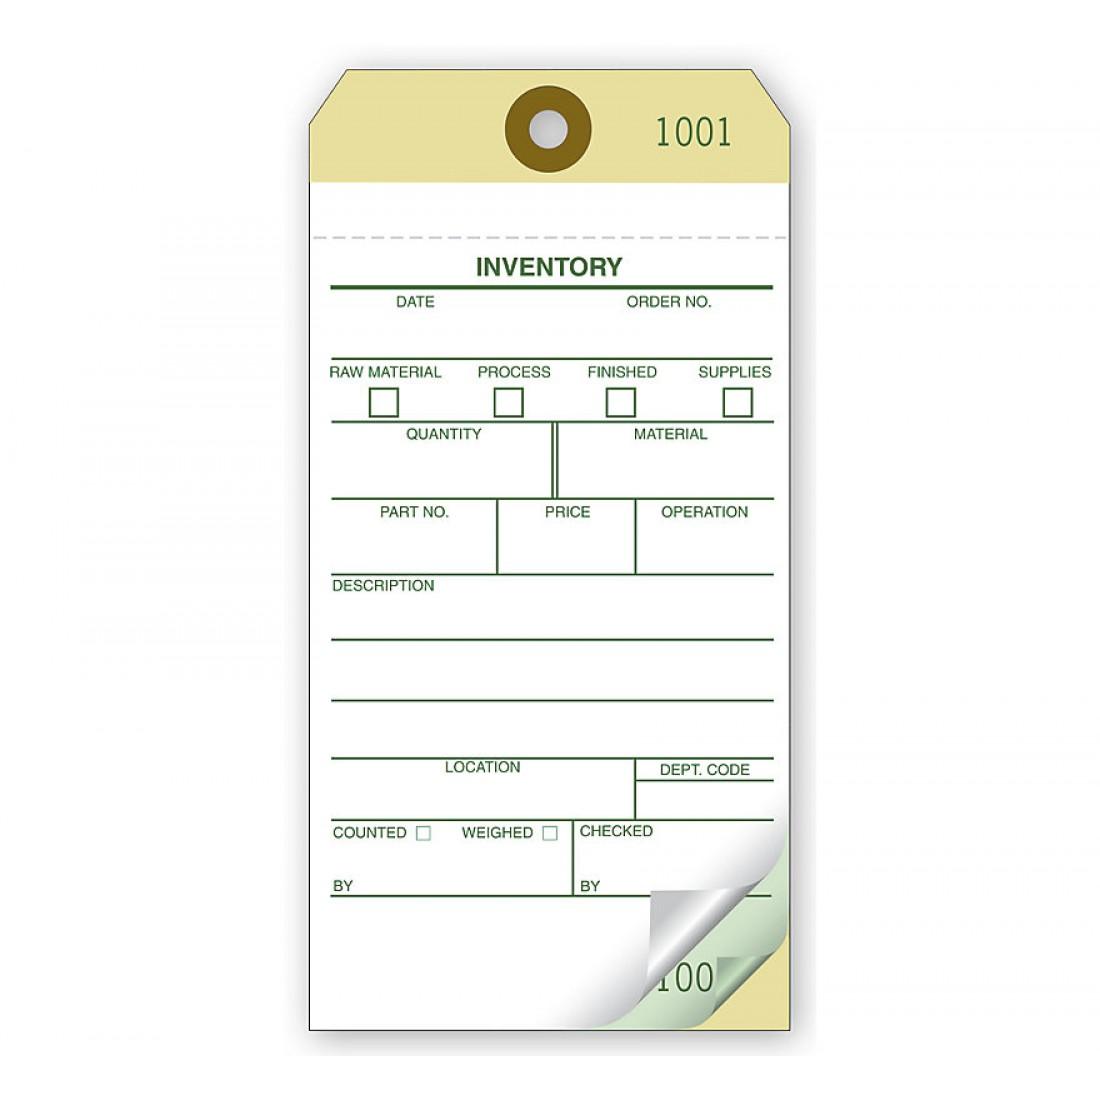 Self Adhesive Inventory Tags